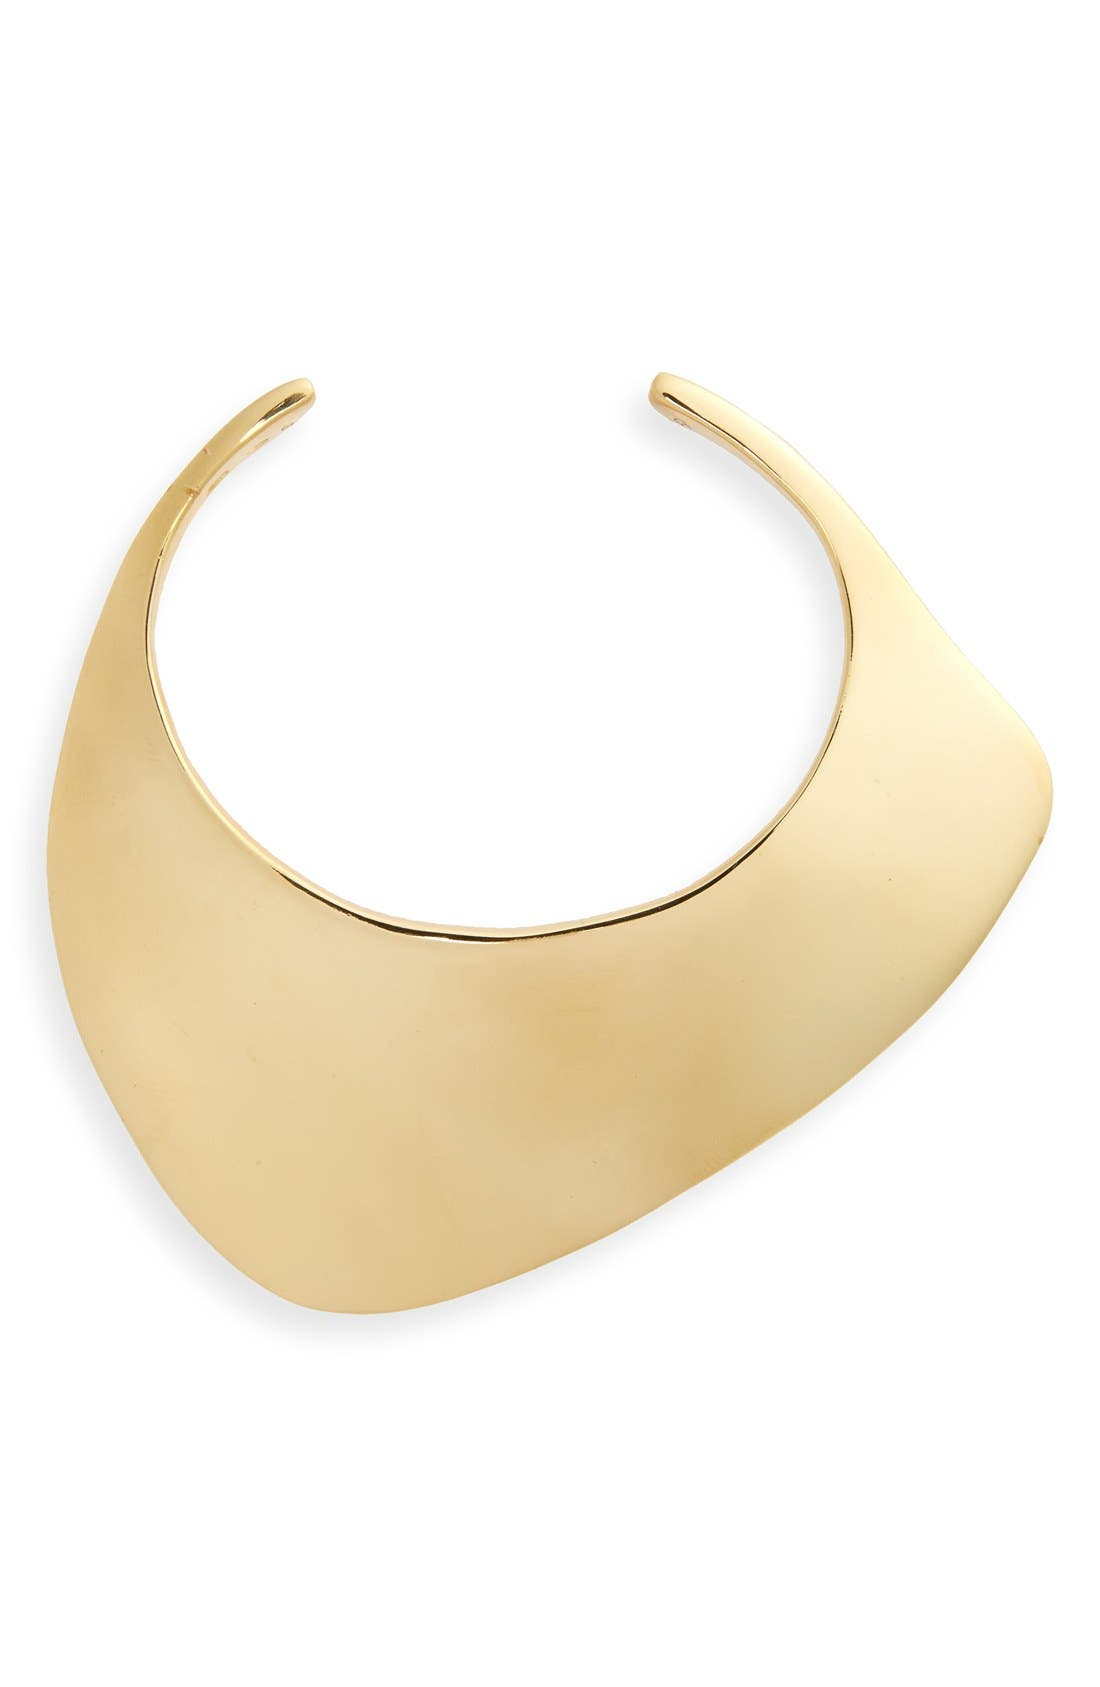 Main Image - Charlotte Chesnais Large Ada Cuff Bracelet